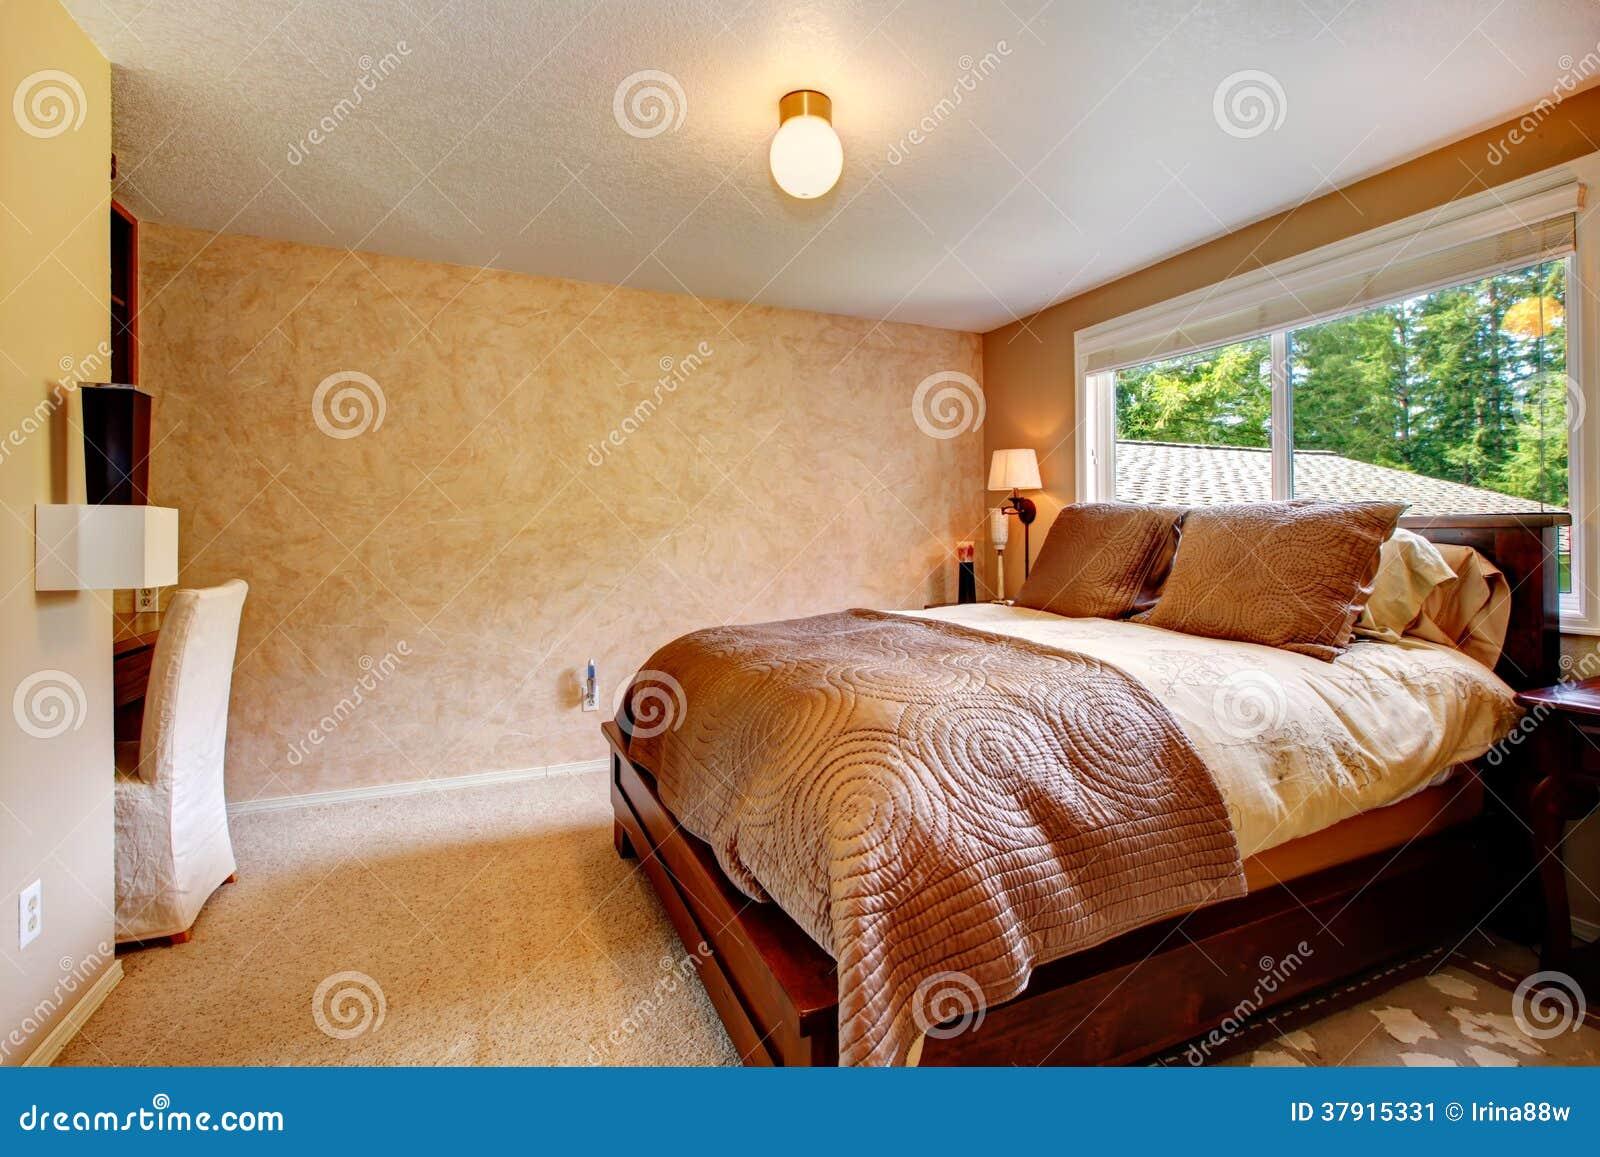 Slaapkamers ontwerp barokke - Barokke stijl kamer ...